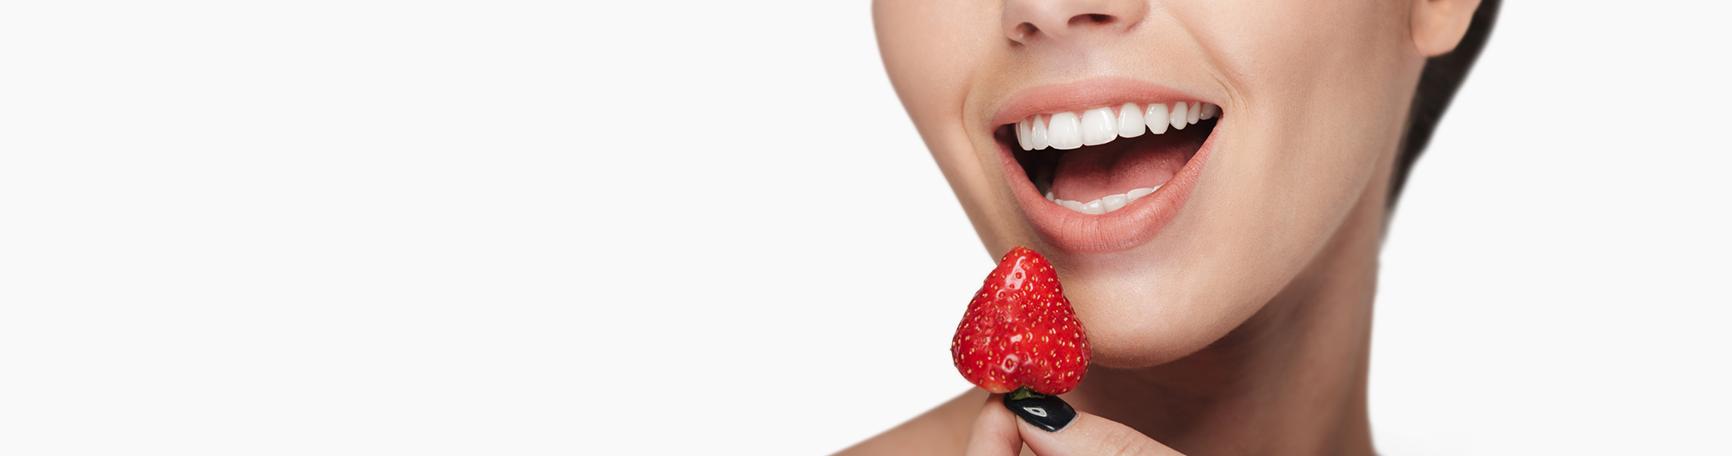 Акция гигиена полости рта